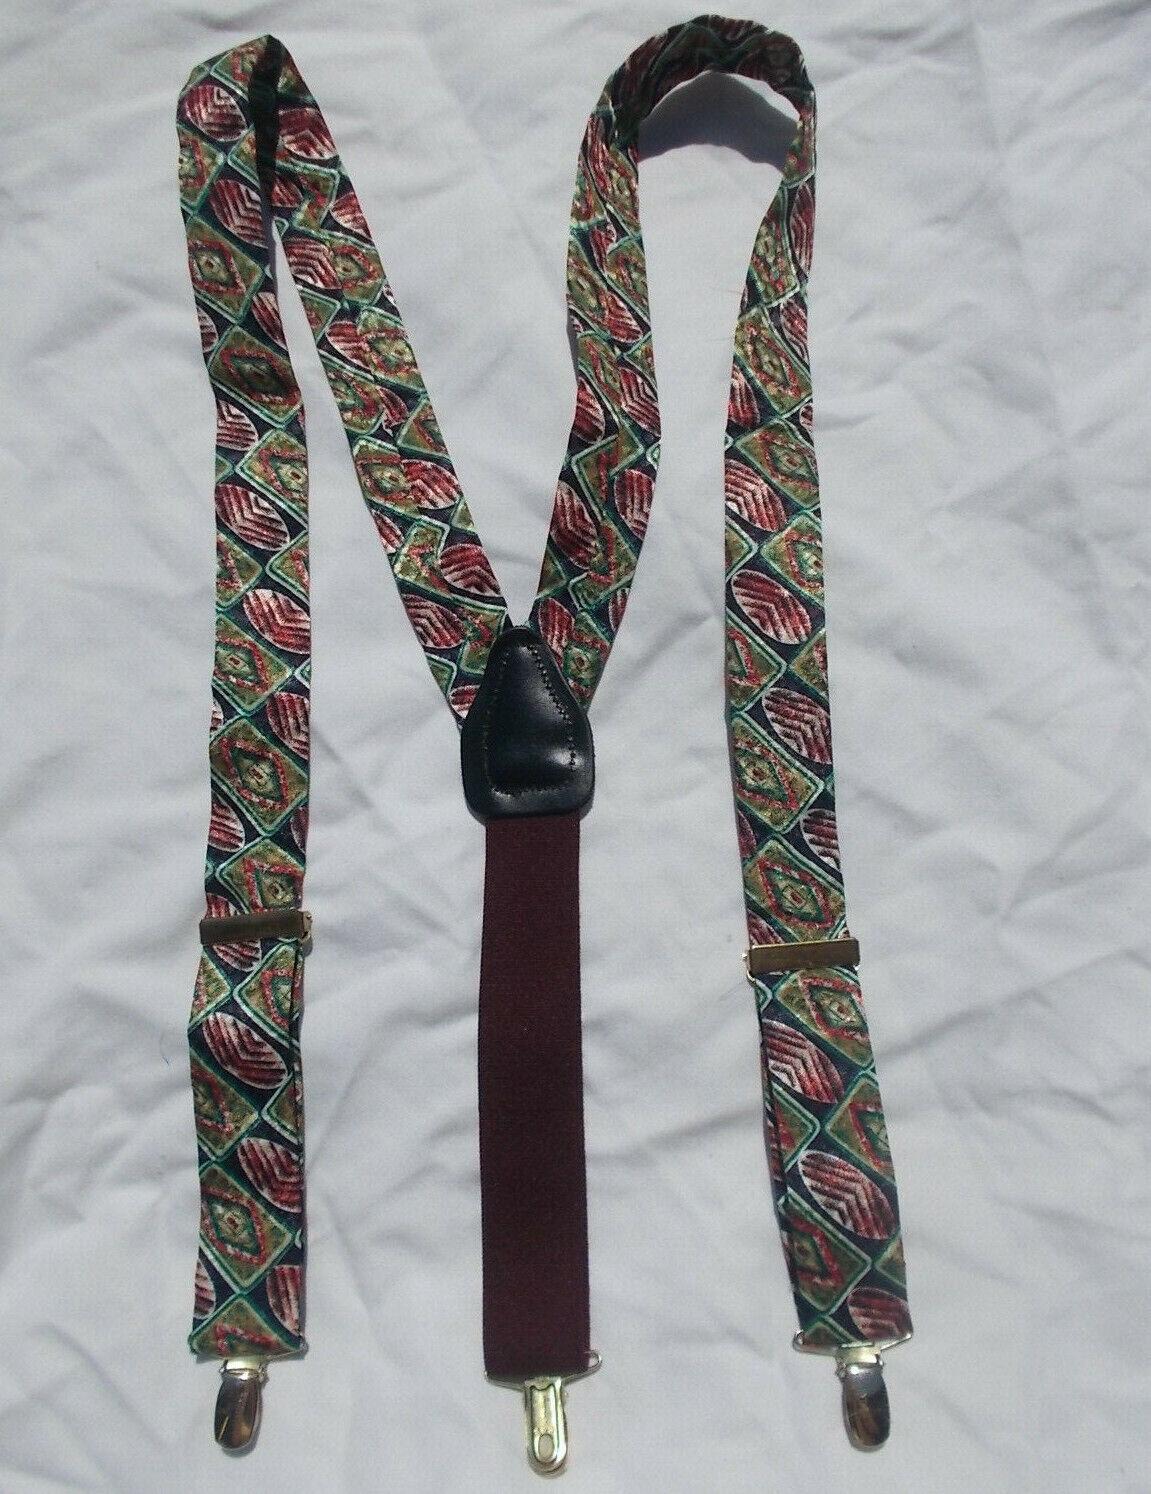 Pants Clip Silk ? Suspenders Burgundy Green Black Mens Gold Tone Clips